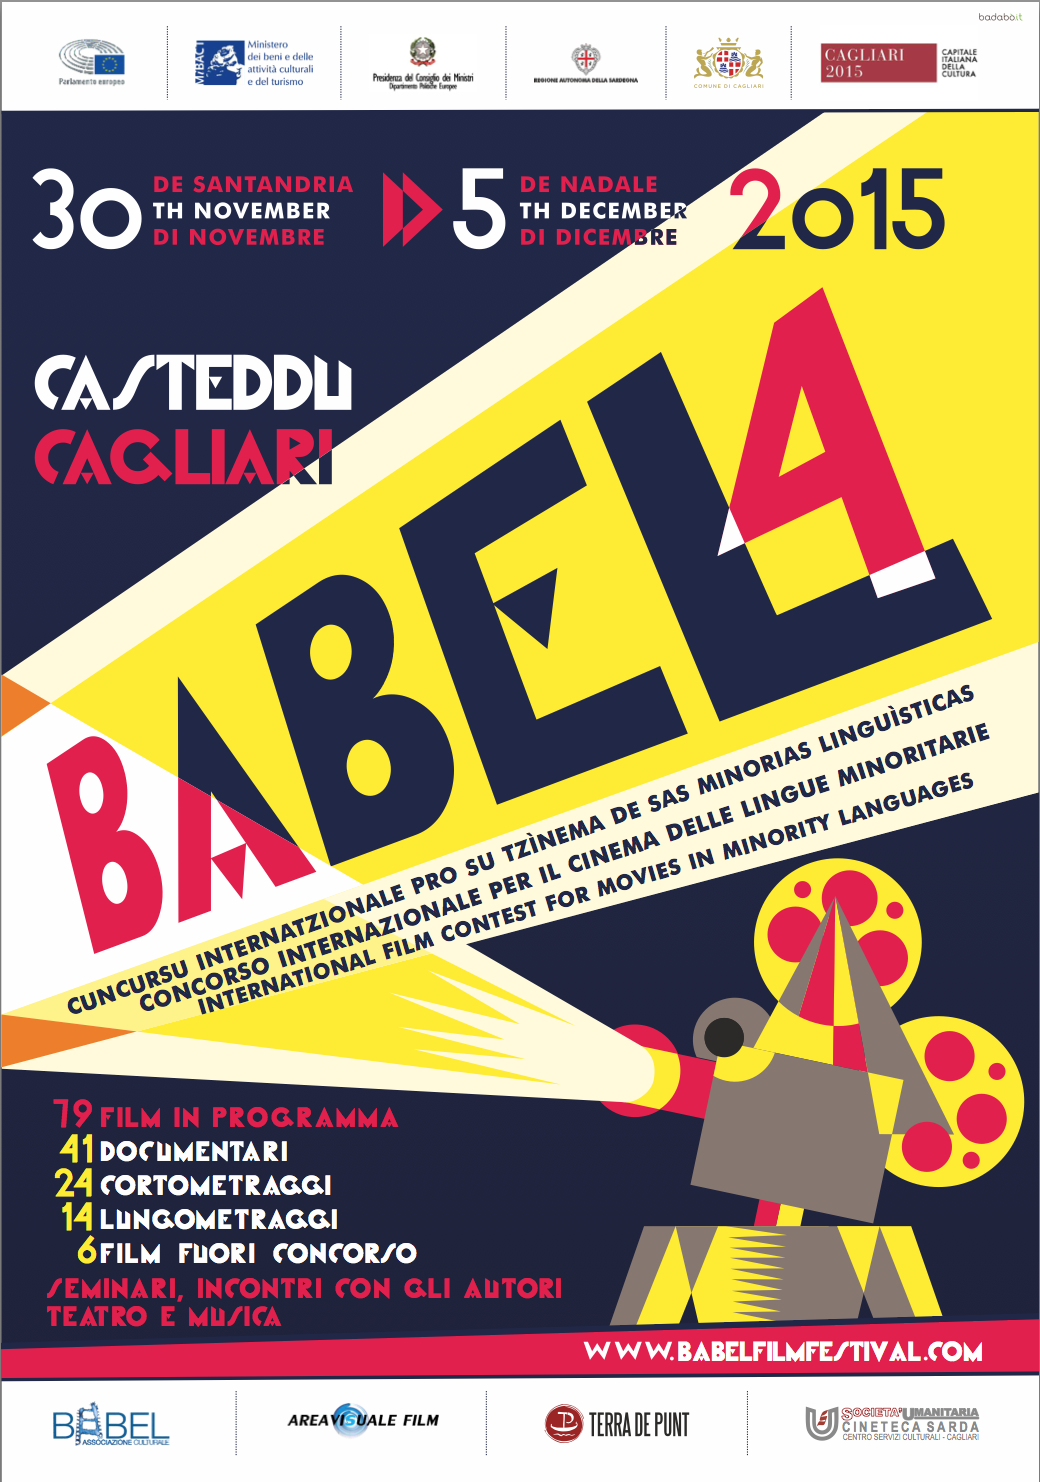 Babel Film Festival 2015 Manifesto